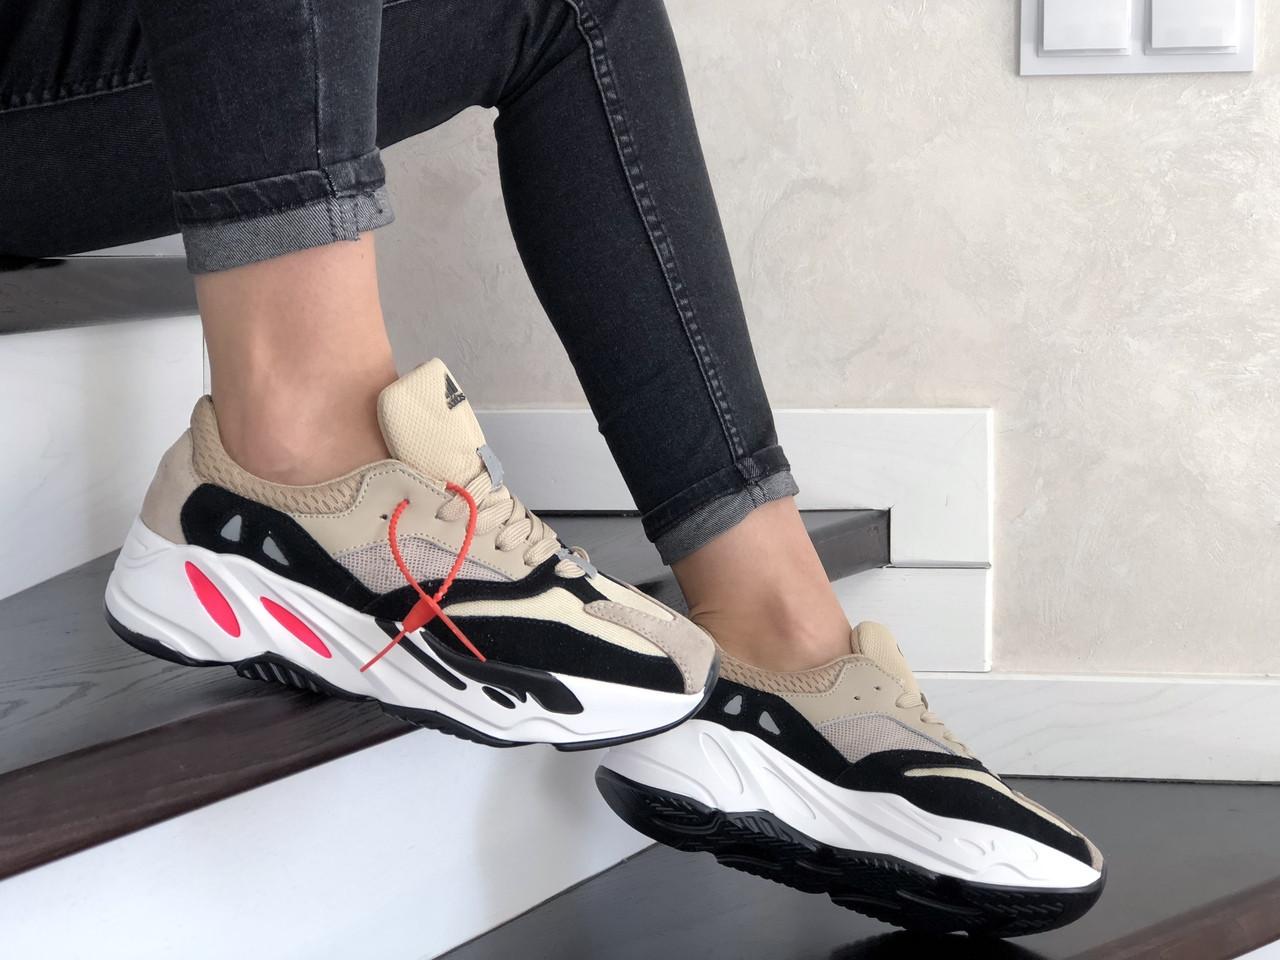 Женские кроссовки Adidas x Yeezy Boost 700 (бежево-белые) 9219